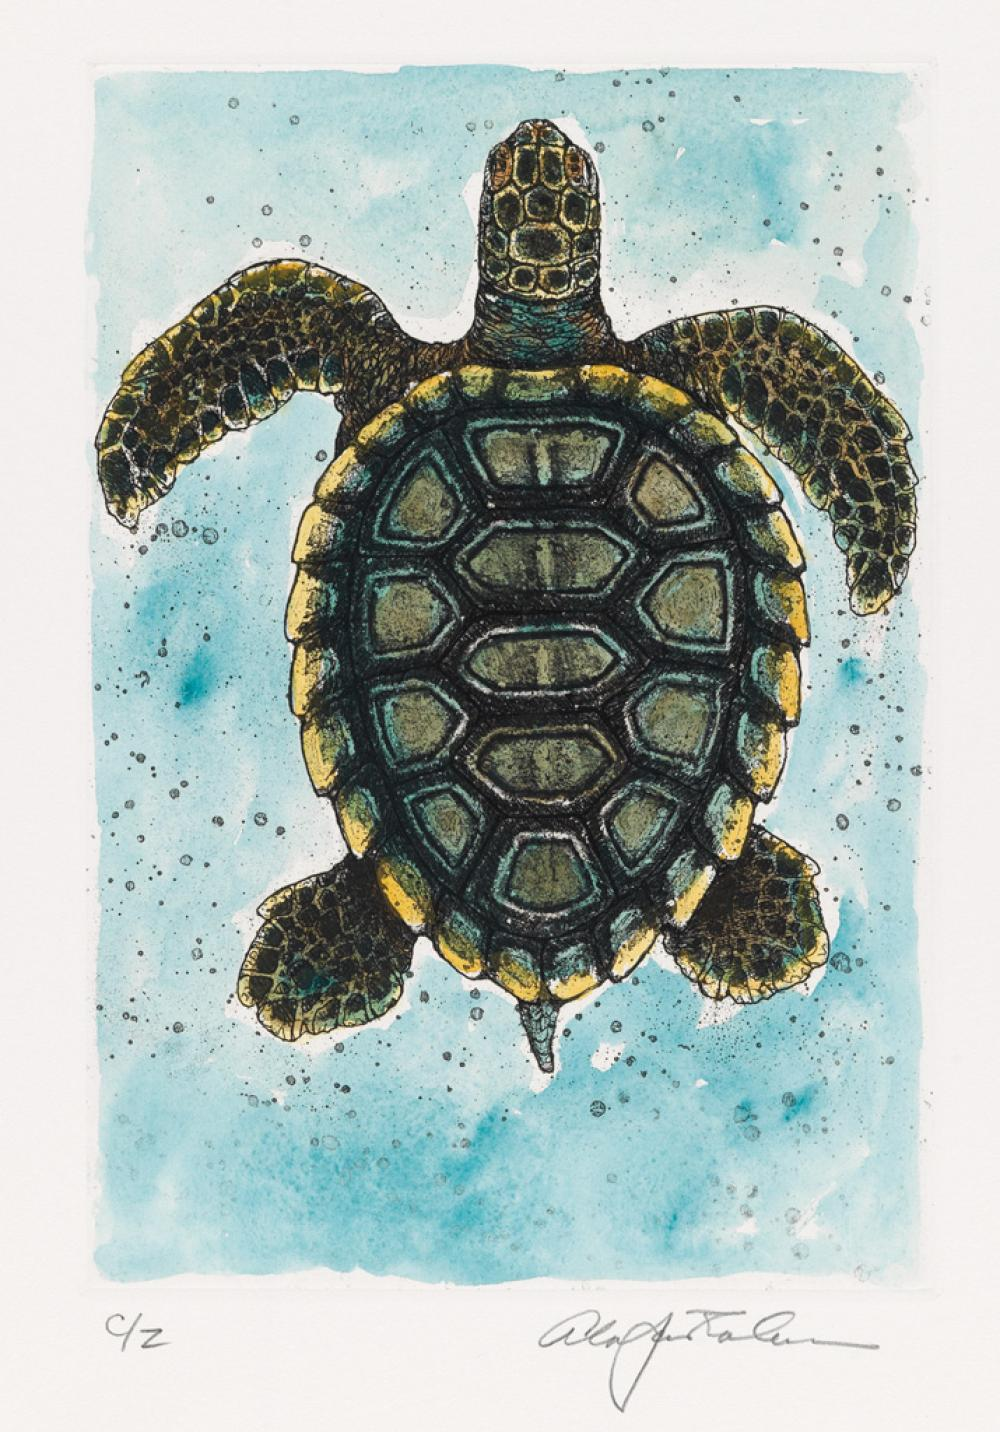 (CHELONIIDAE PRESS.) Goodrich, S. G. Cheloniidae: Sea Turtles.